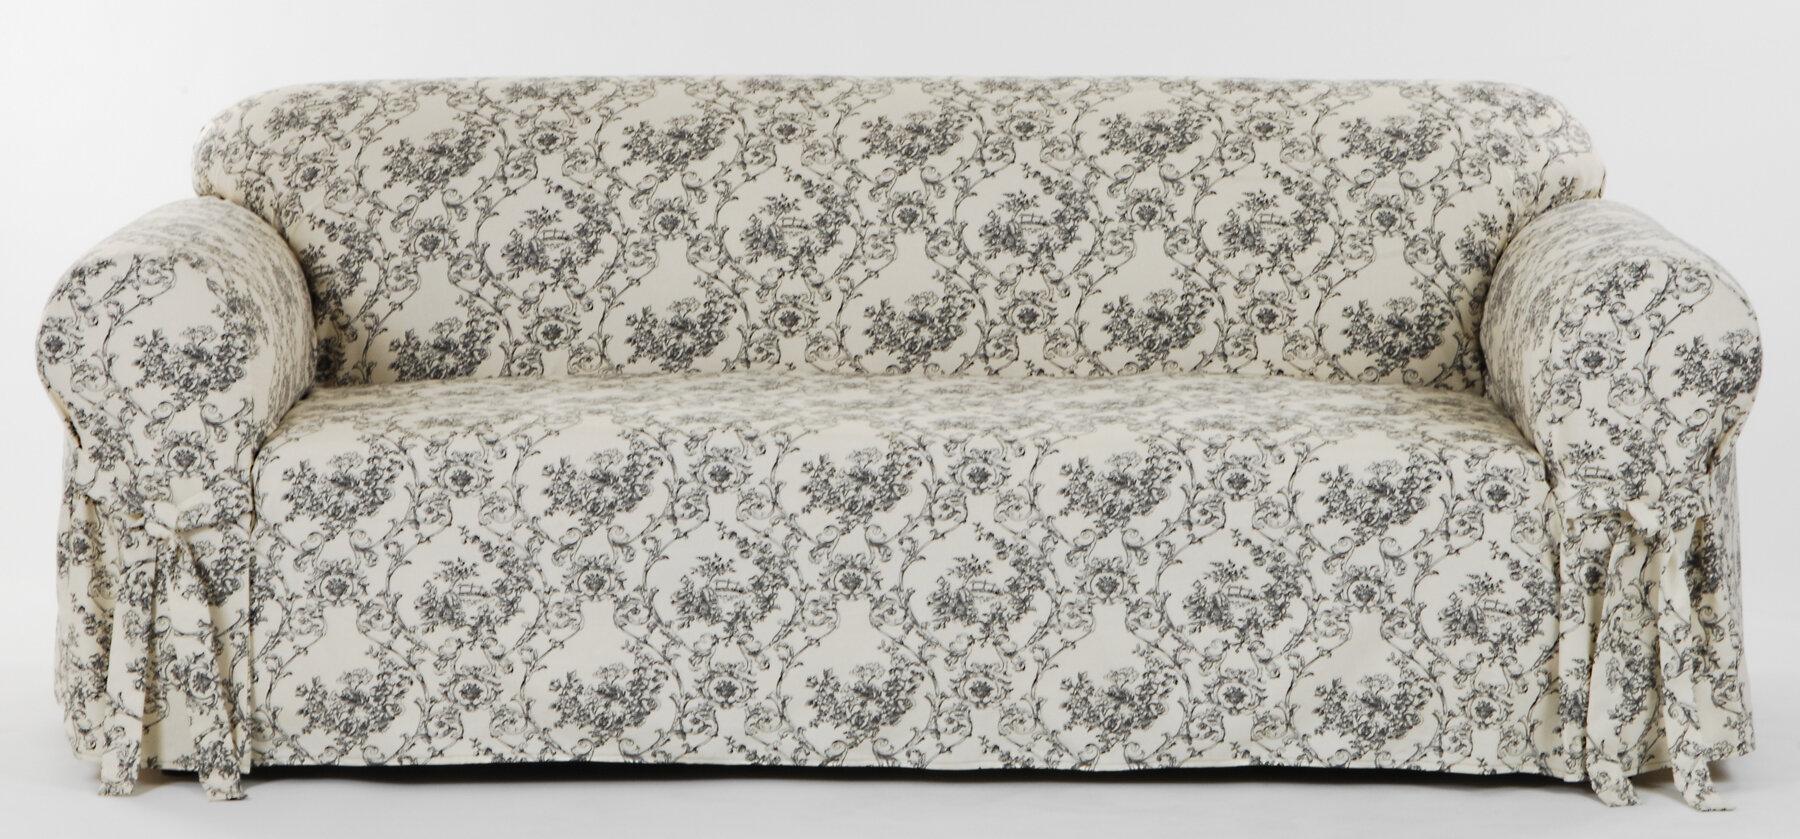 Clic Slipcovers Toile Print Box Cushion Sofa Slipcover Reviews Wayfair